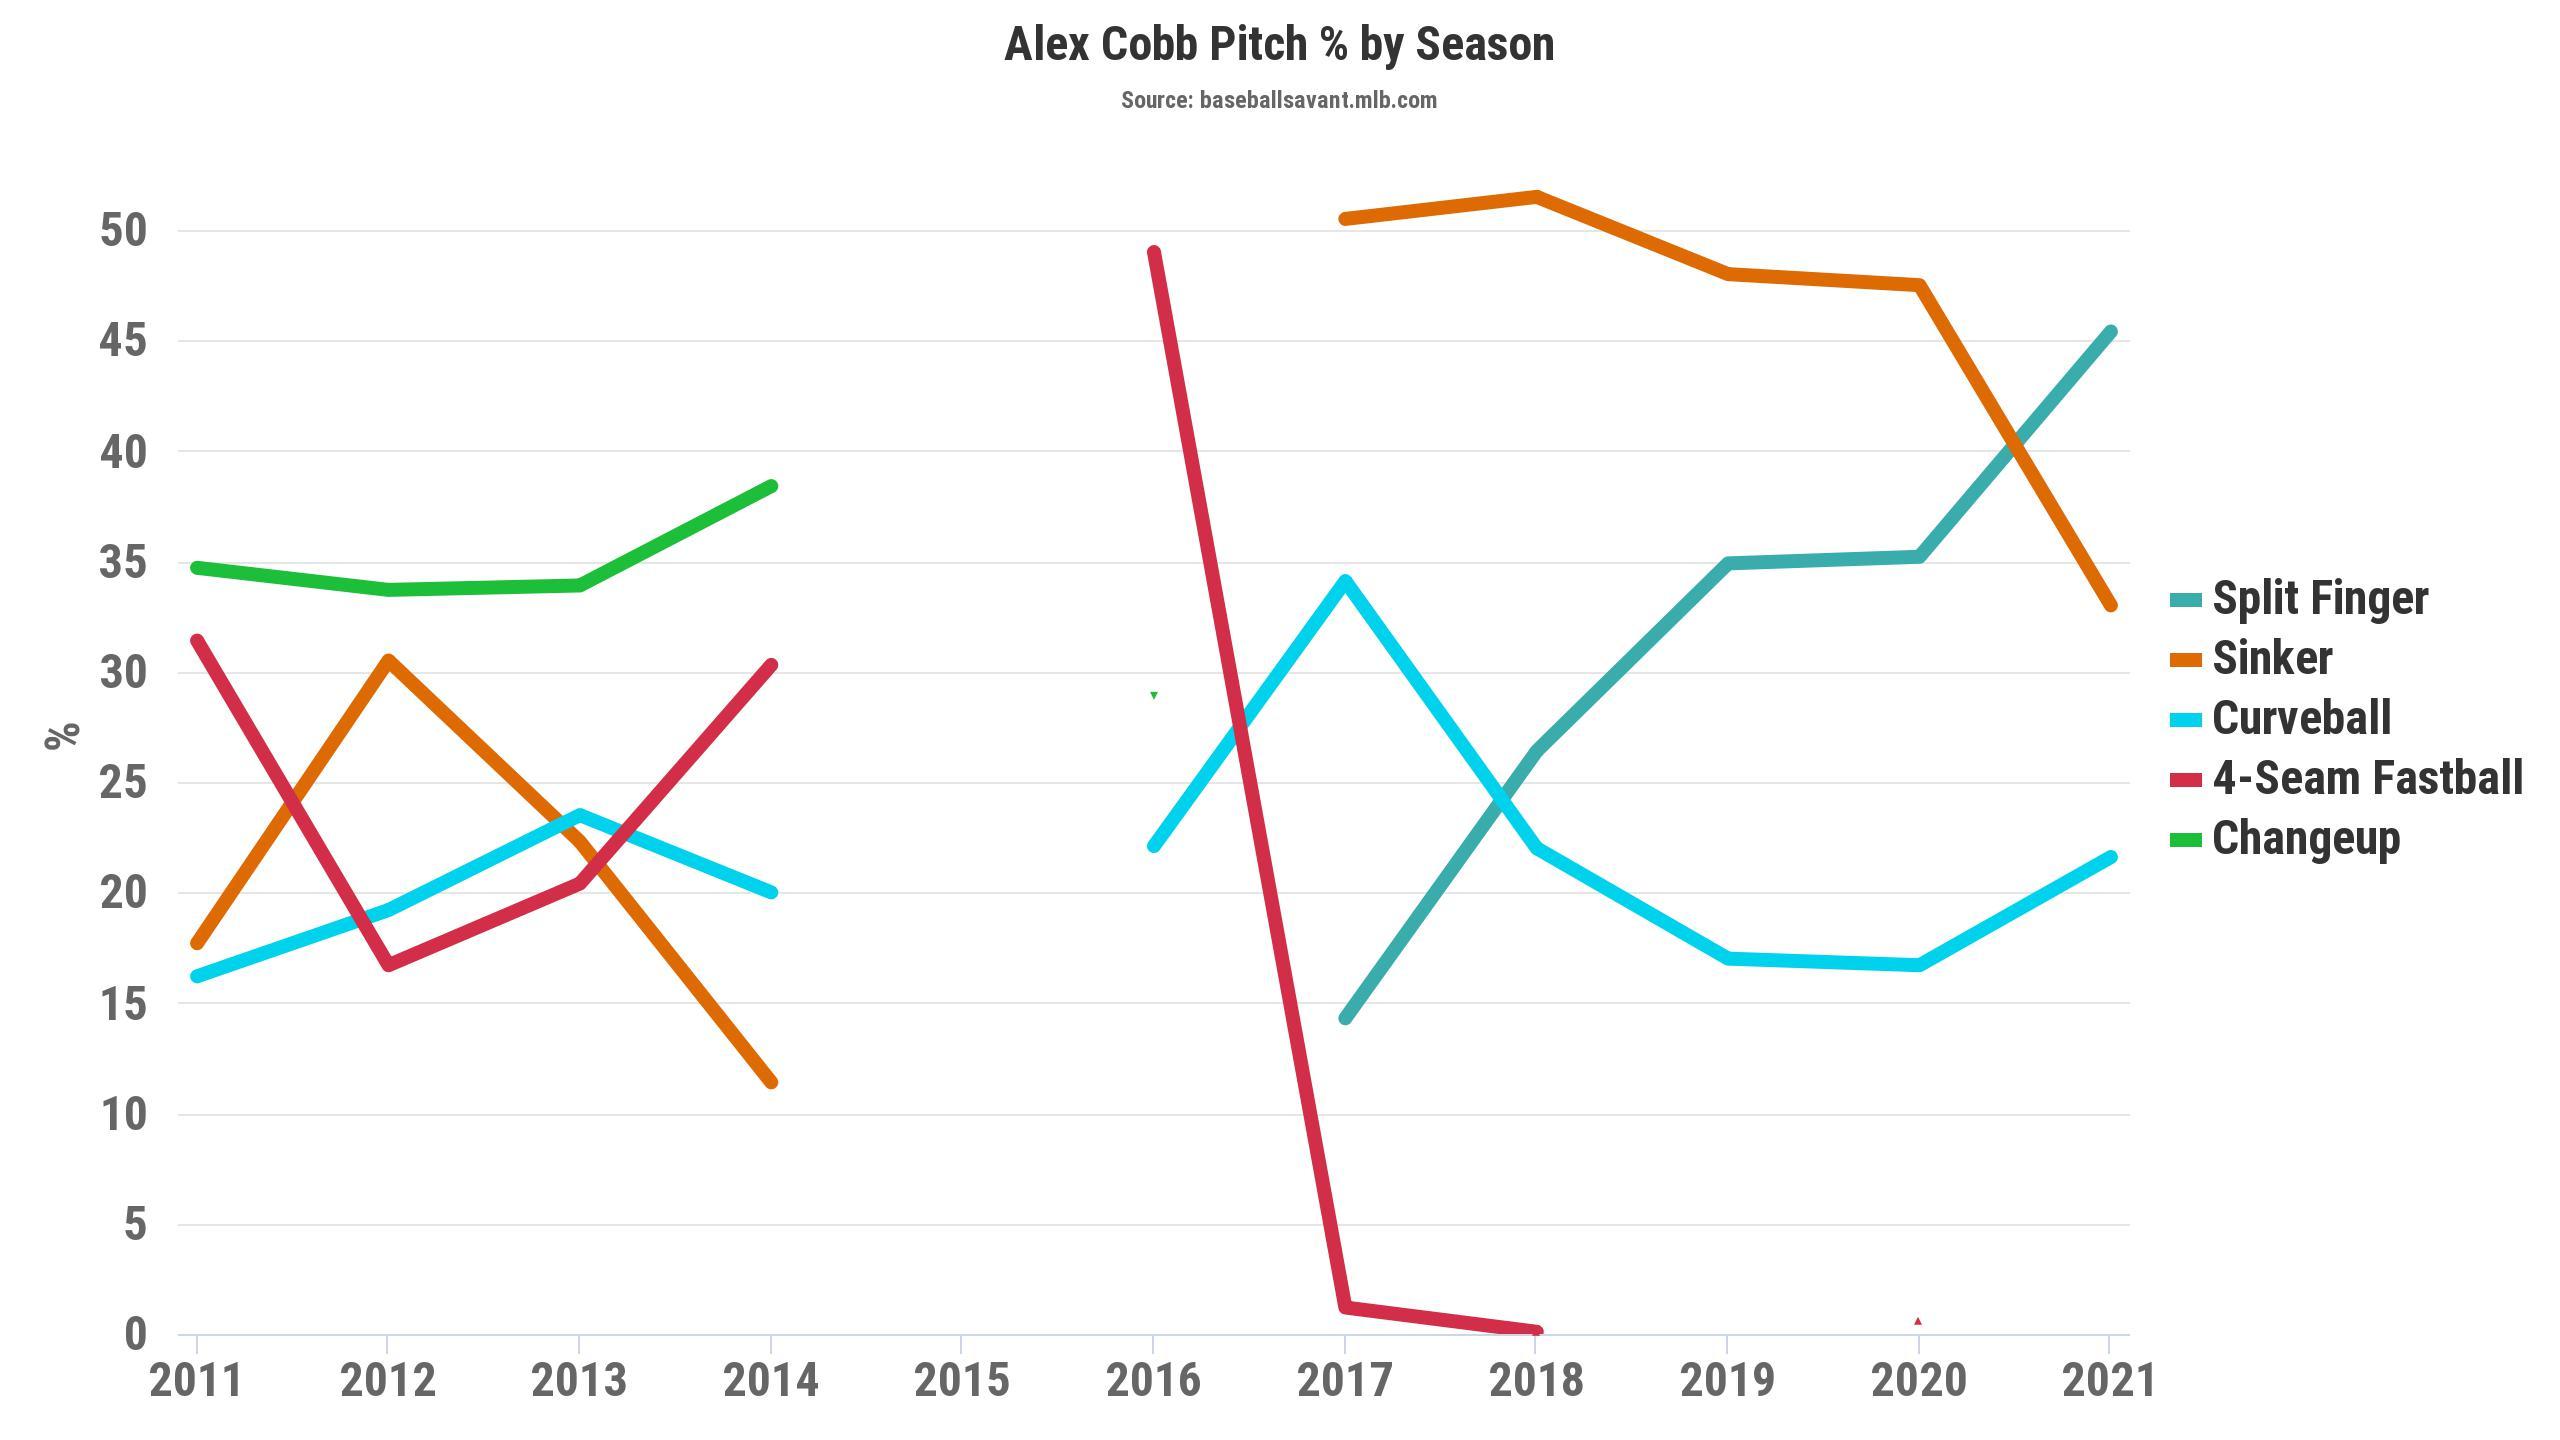 Cobb starting pitcher rankings